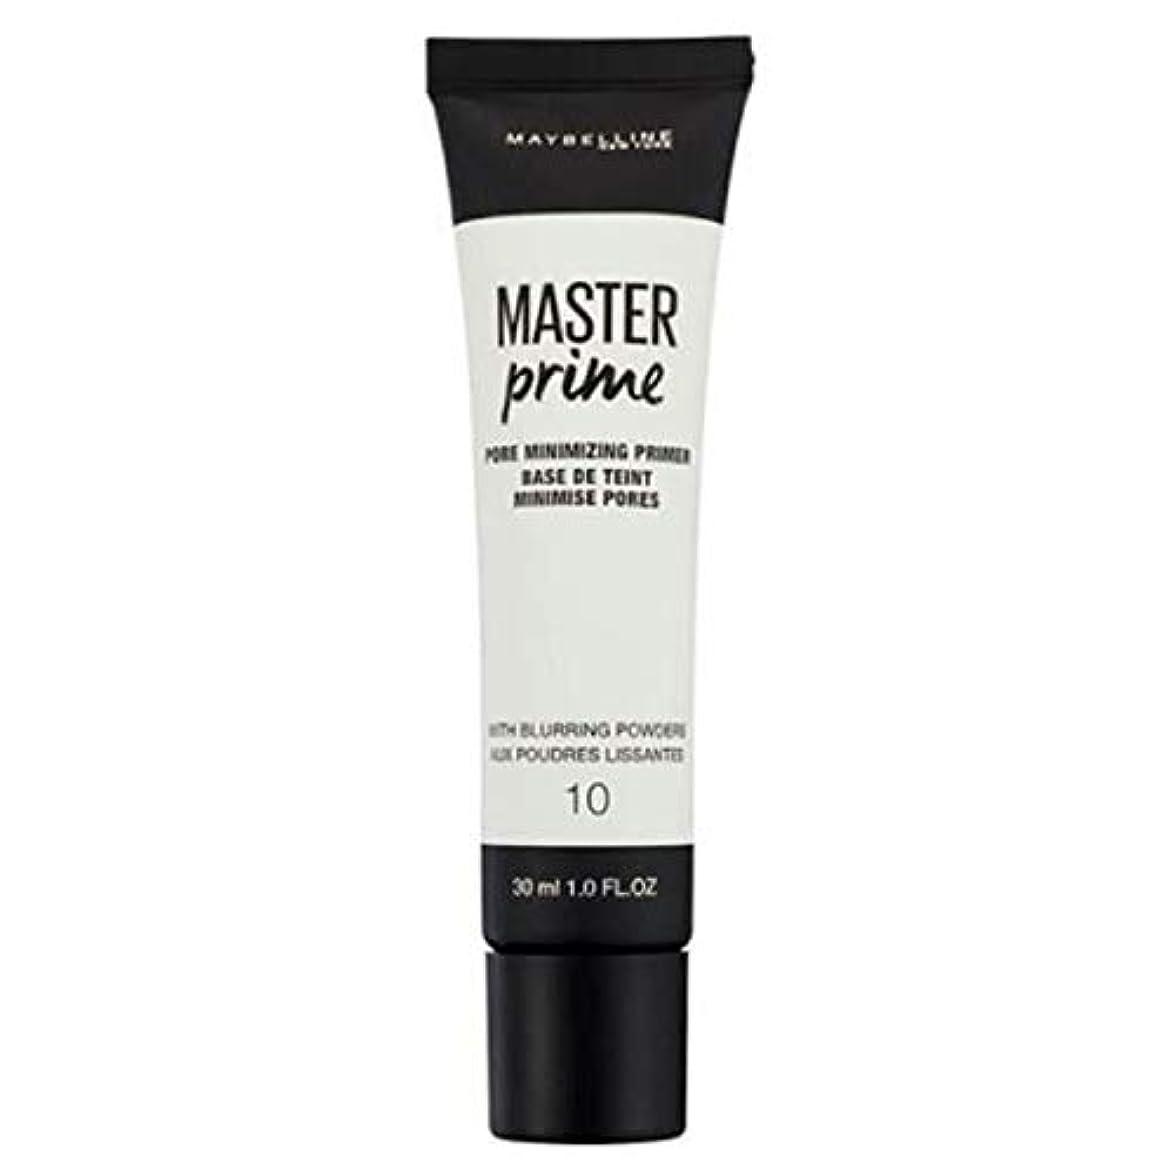 [Maybelline ] メイベリンマスタープライム細孔最小限にプライマーをクリア10 - Maybelline Master Prime Pore Minimizing Primer Clear 10 [並行輸入品]